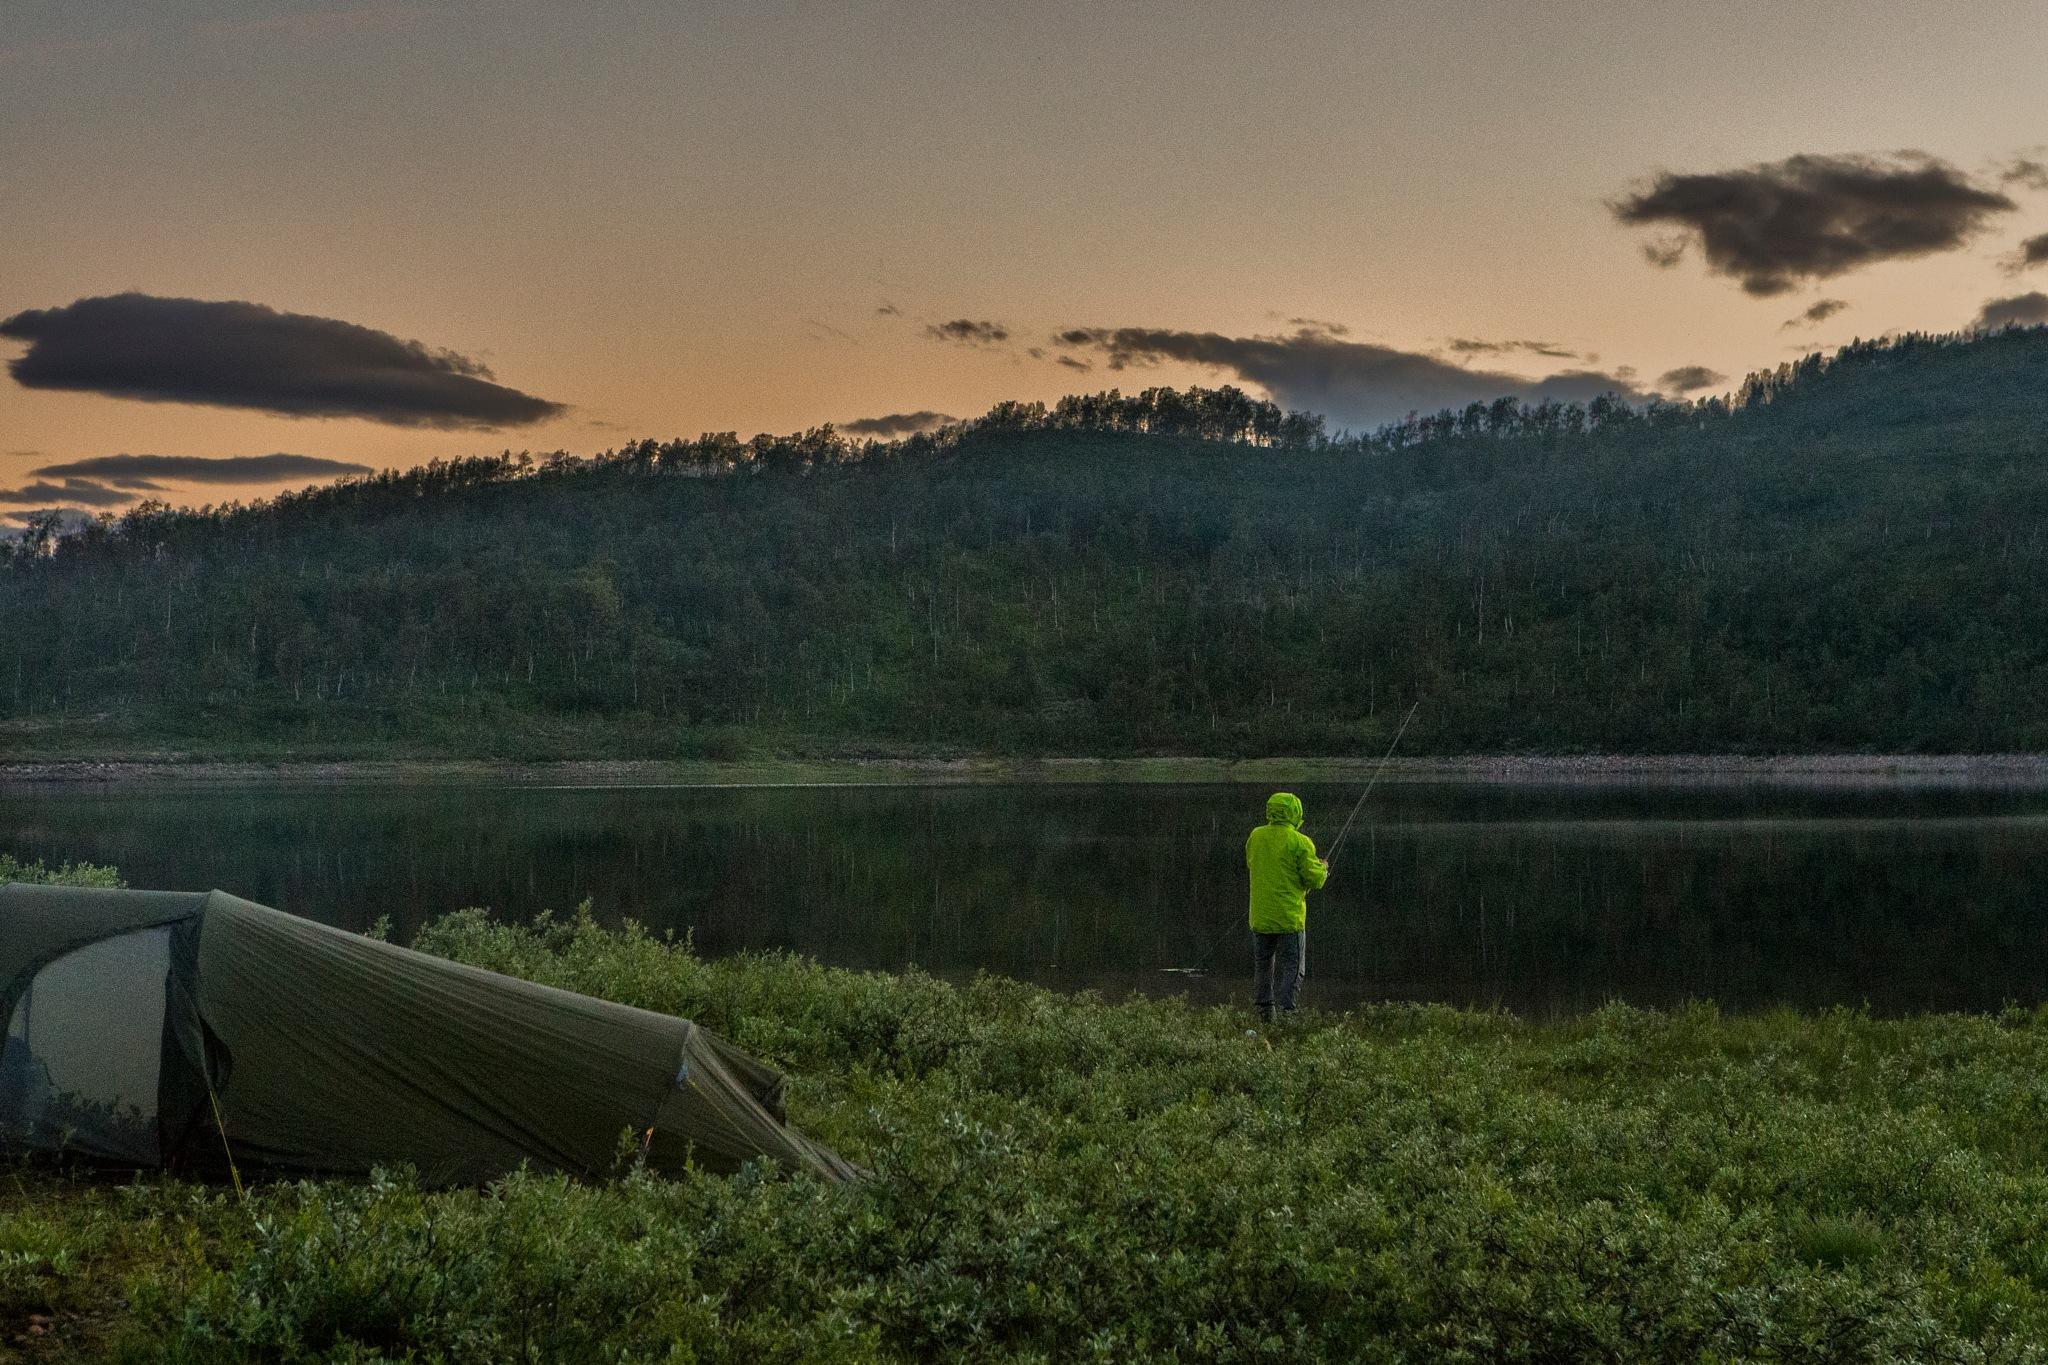 Camping life ツ by Odd Rune Wang